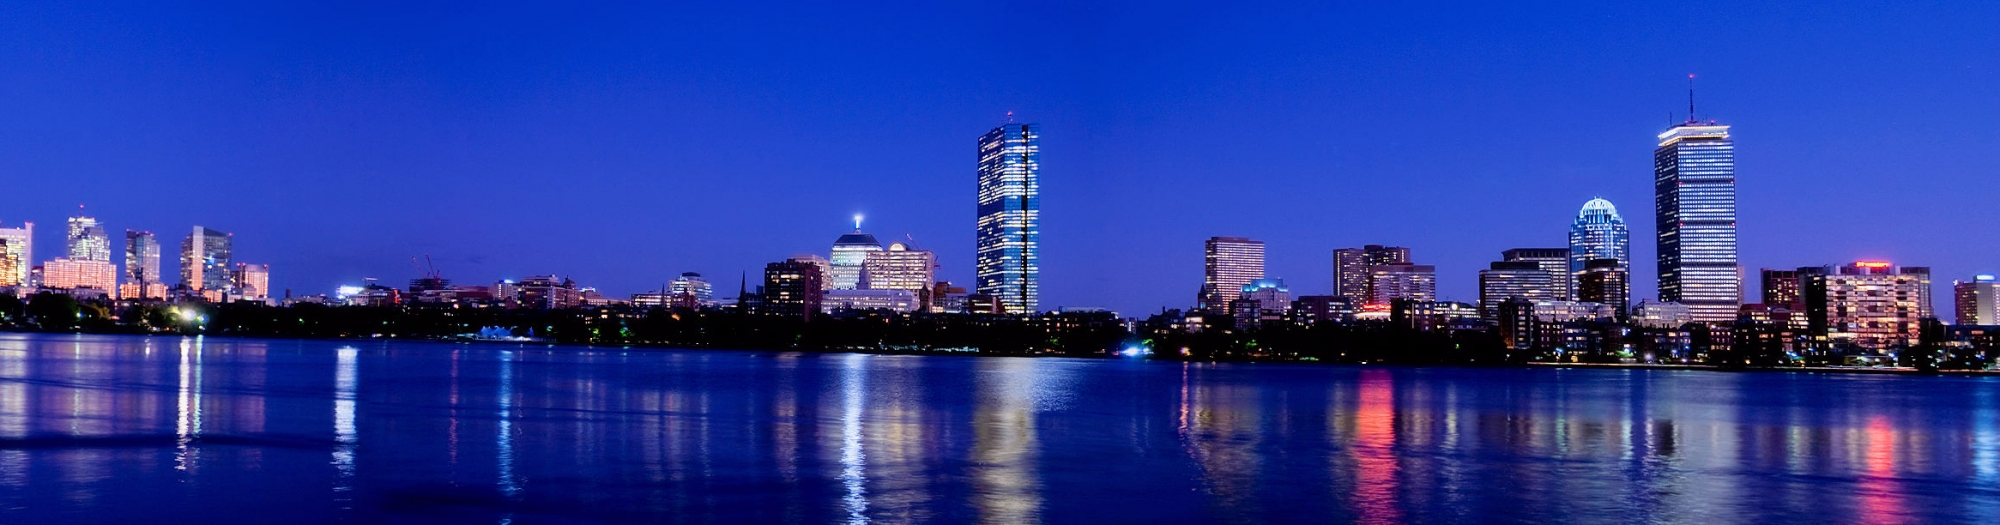 Ian's Boston Adventures blog header photo: A gorgeous shot of the Boston skyline at dusk.